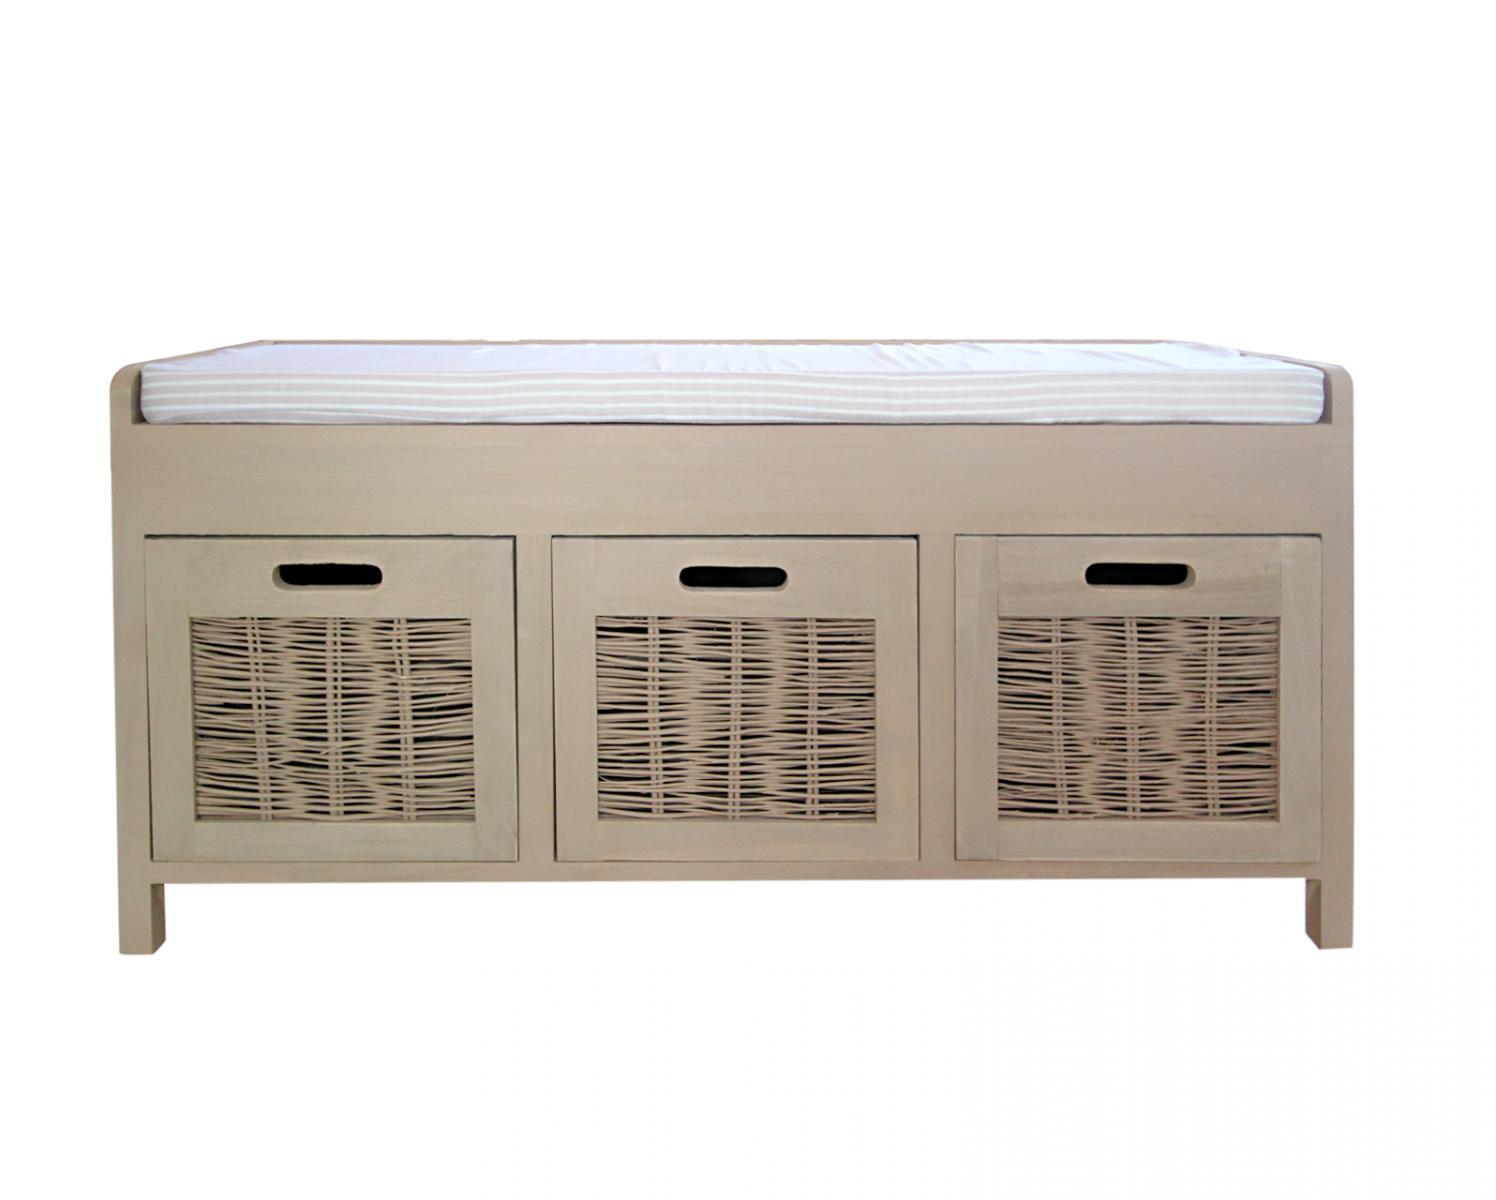 Mudroom Storage Units For Sale : Hall bench storage unit images